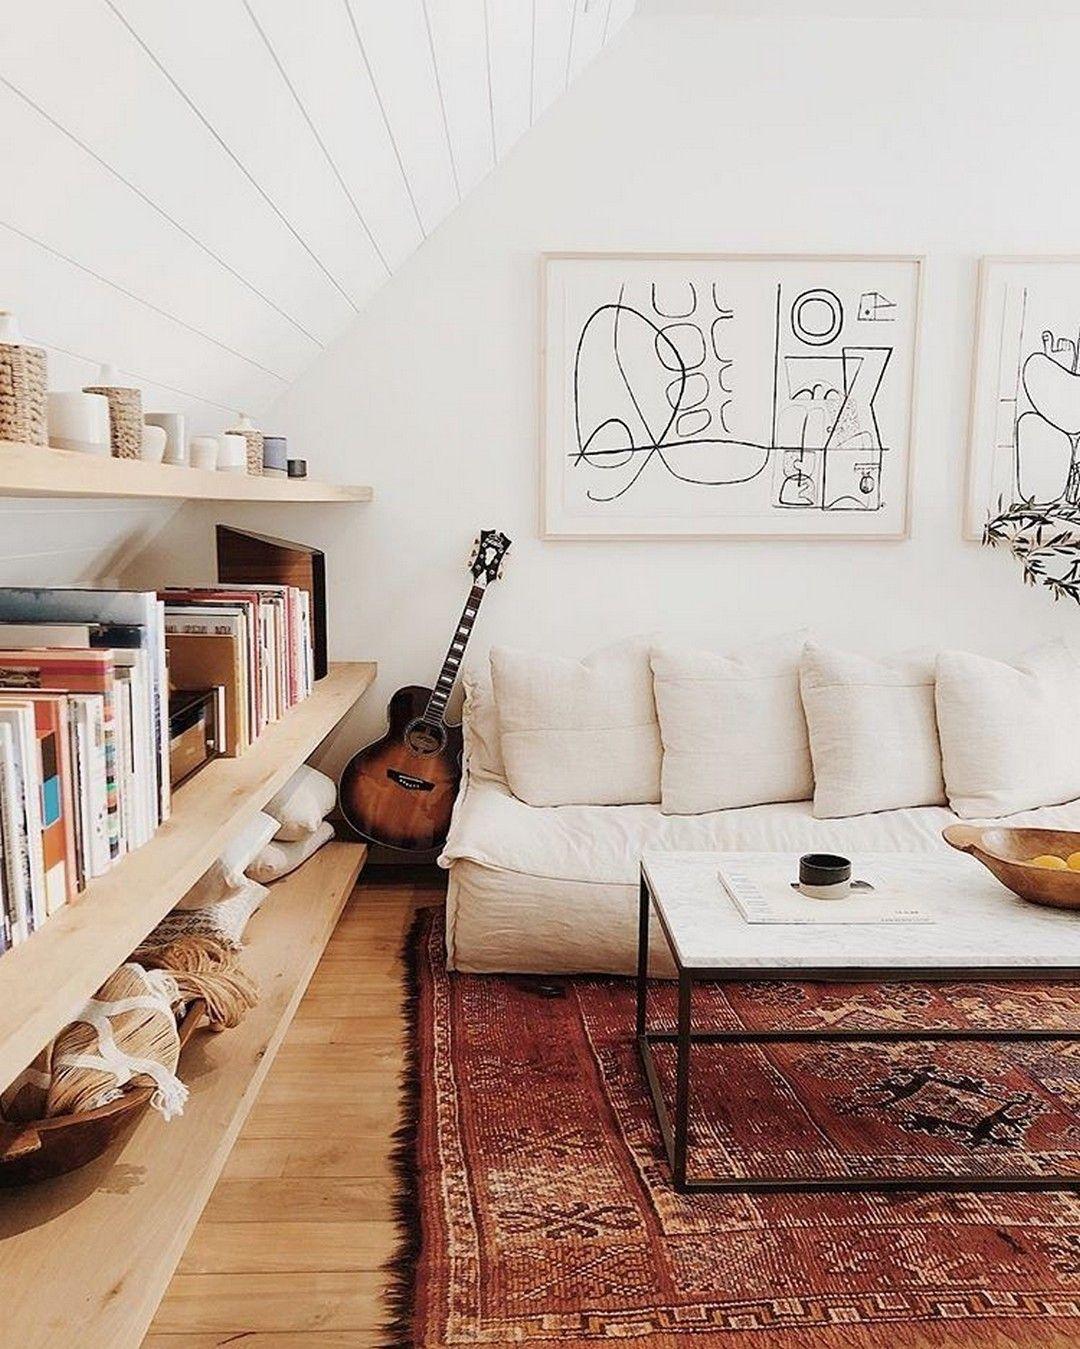 Stunning ways to decorate the perfect bohemian living room livingroom livingroomdecor livingroomdecorideas also cheap home christmas decorations masoniteinteriordoors masonite rh pinterest